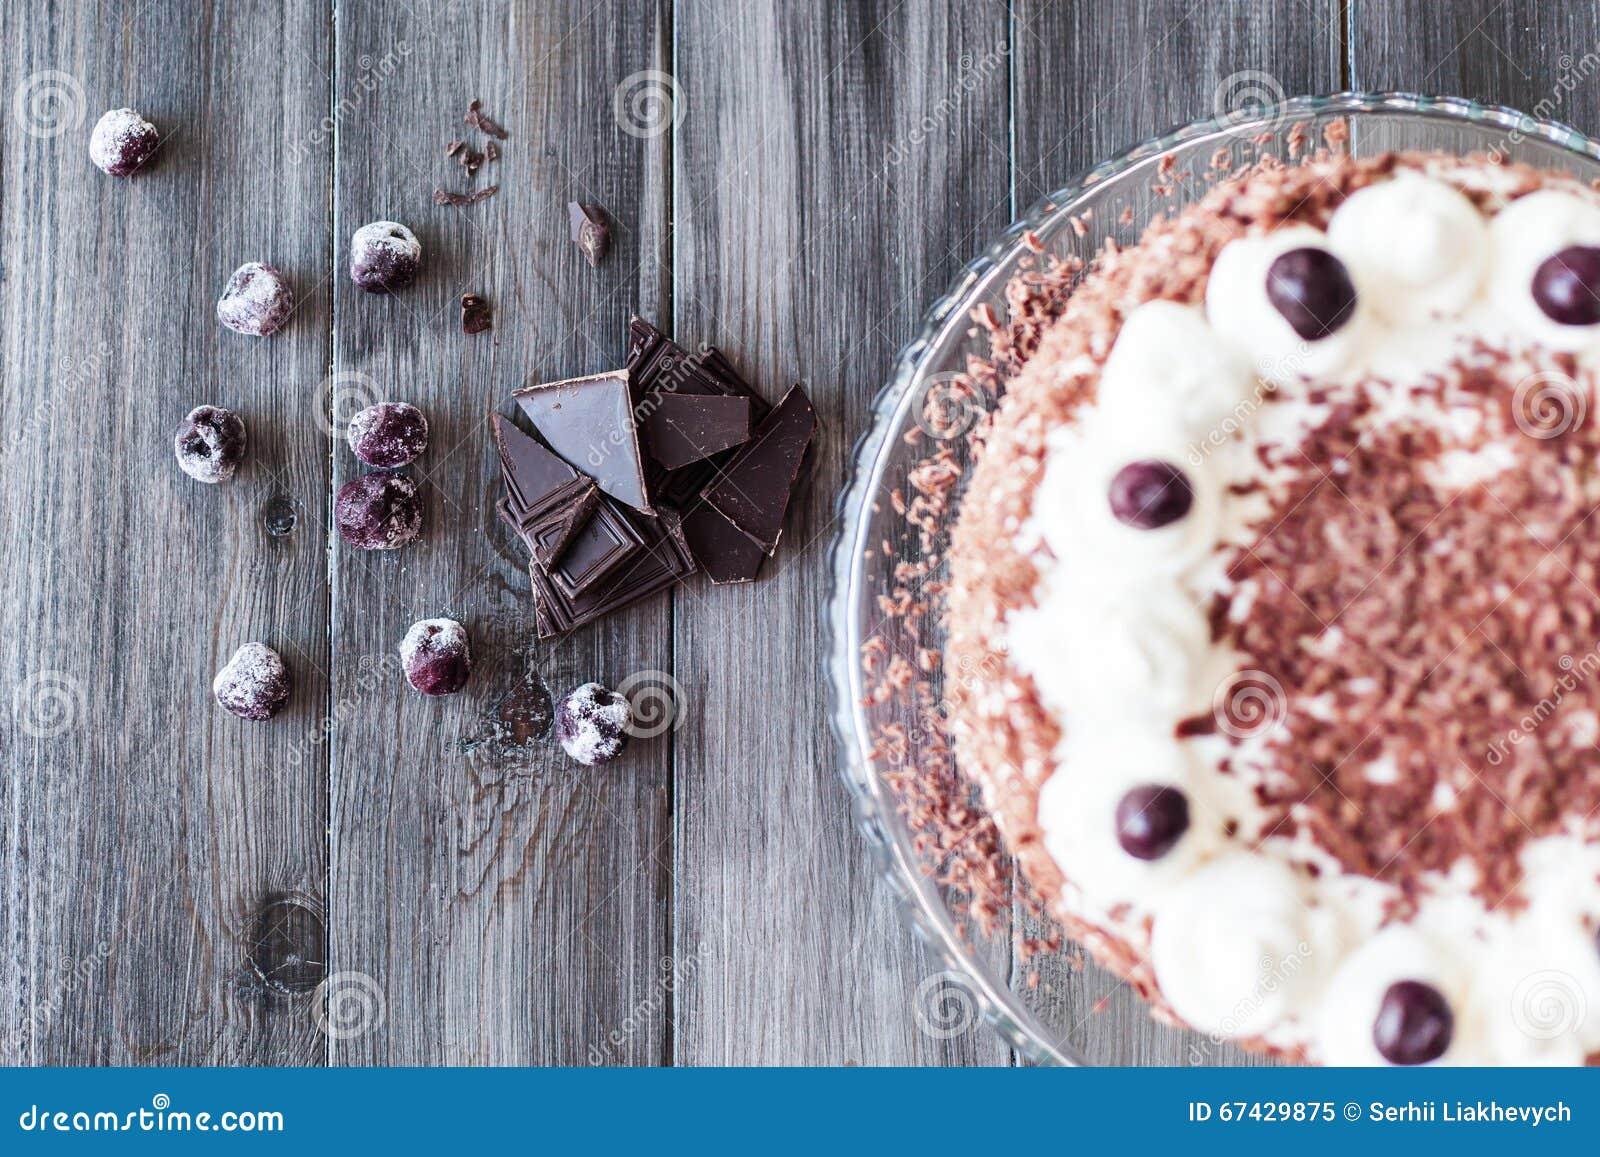 Chocolate Cake Decorated With Cherries